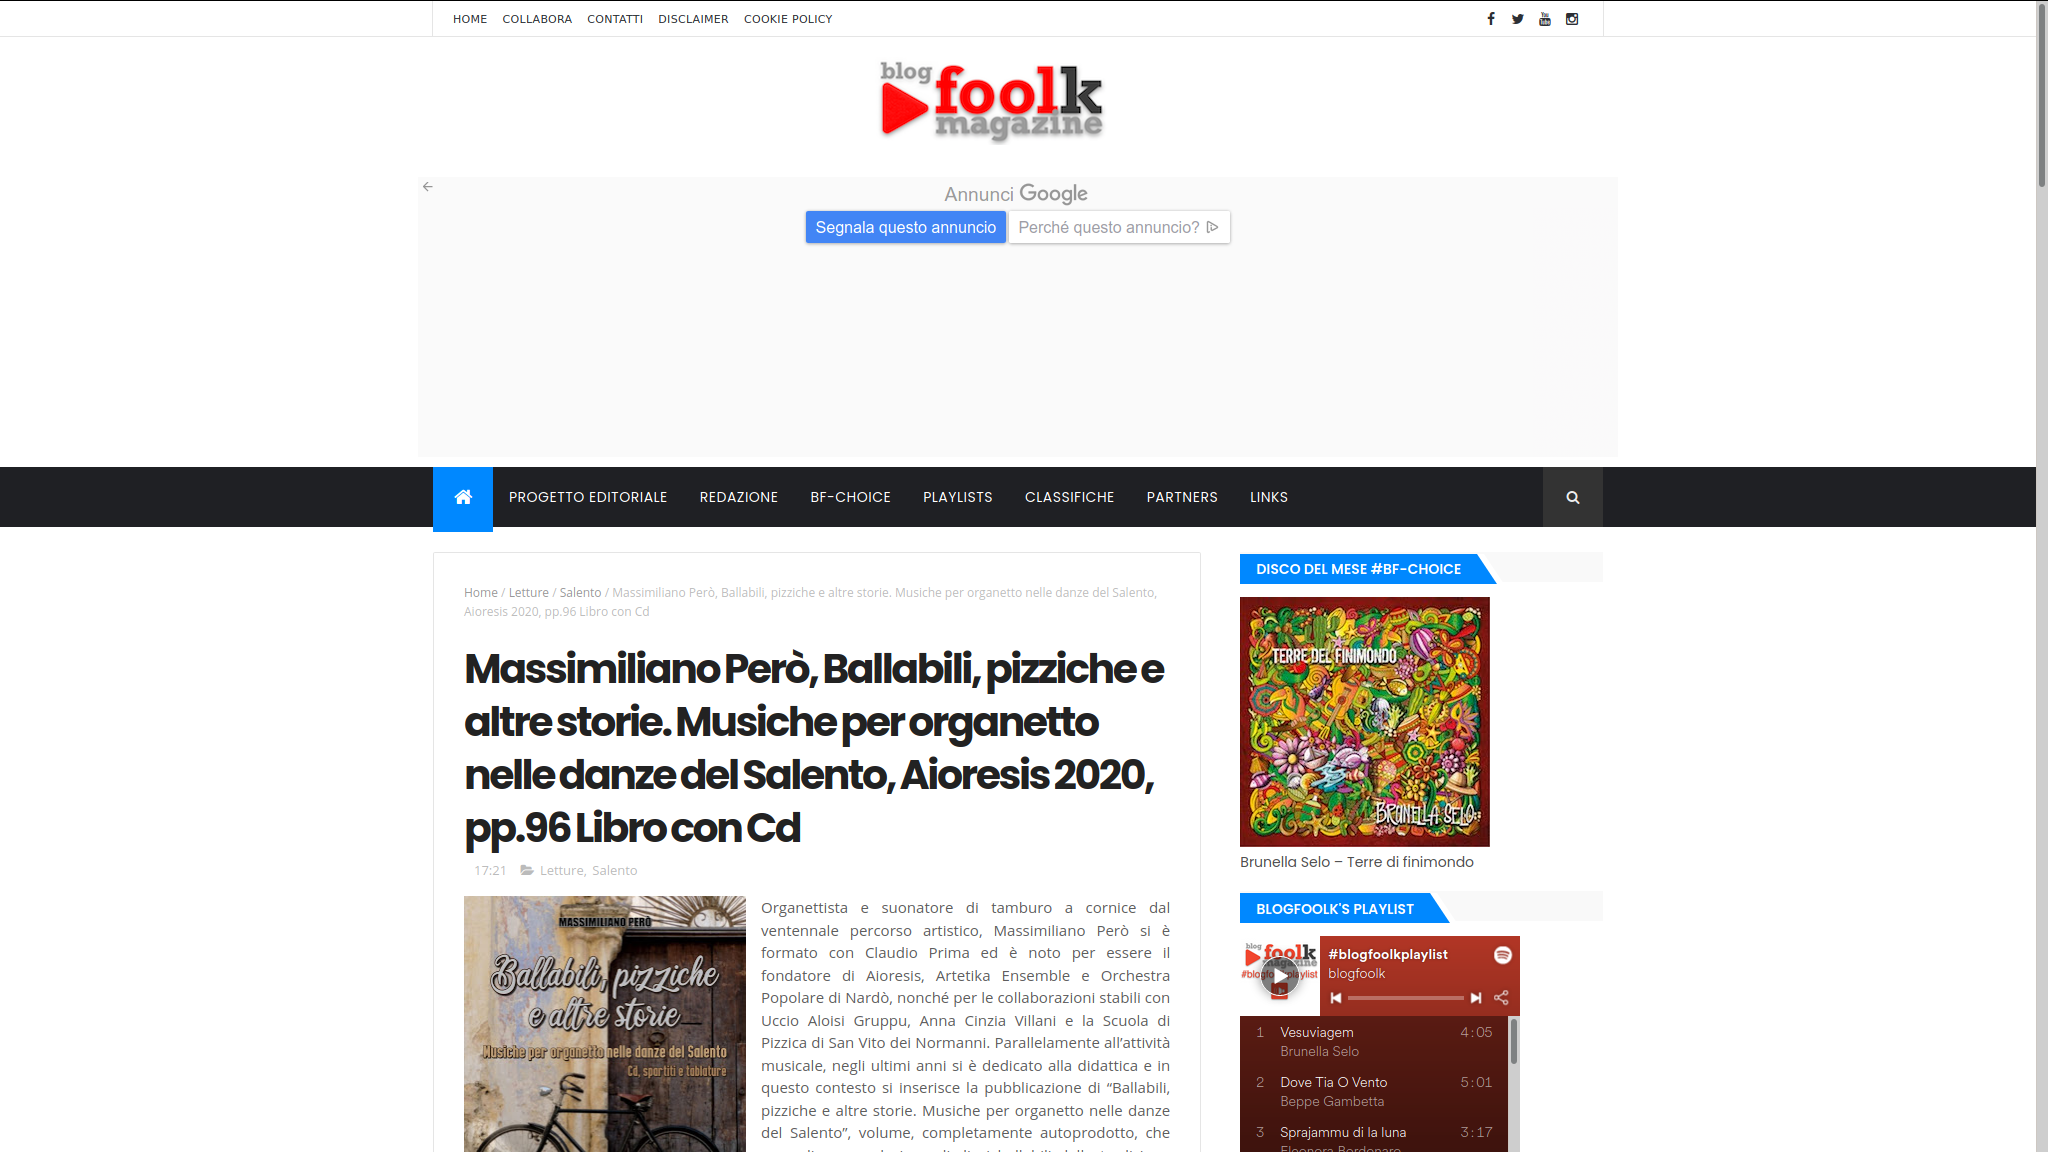 aioresis-news-blogfoolk